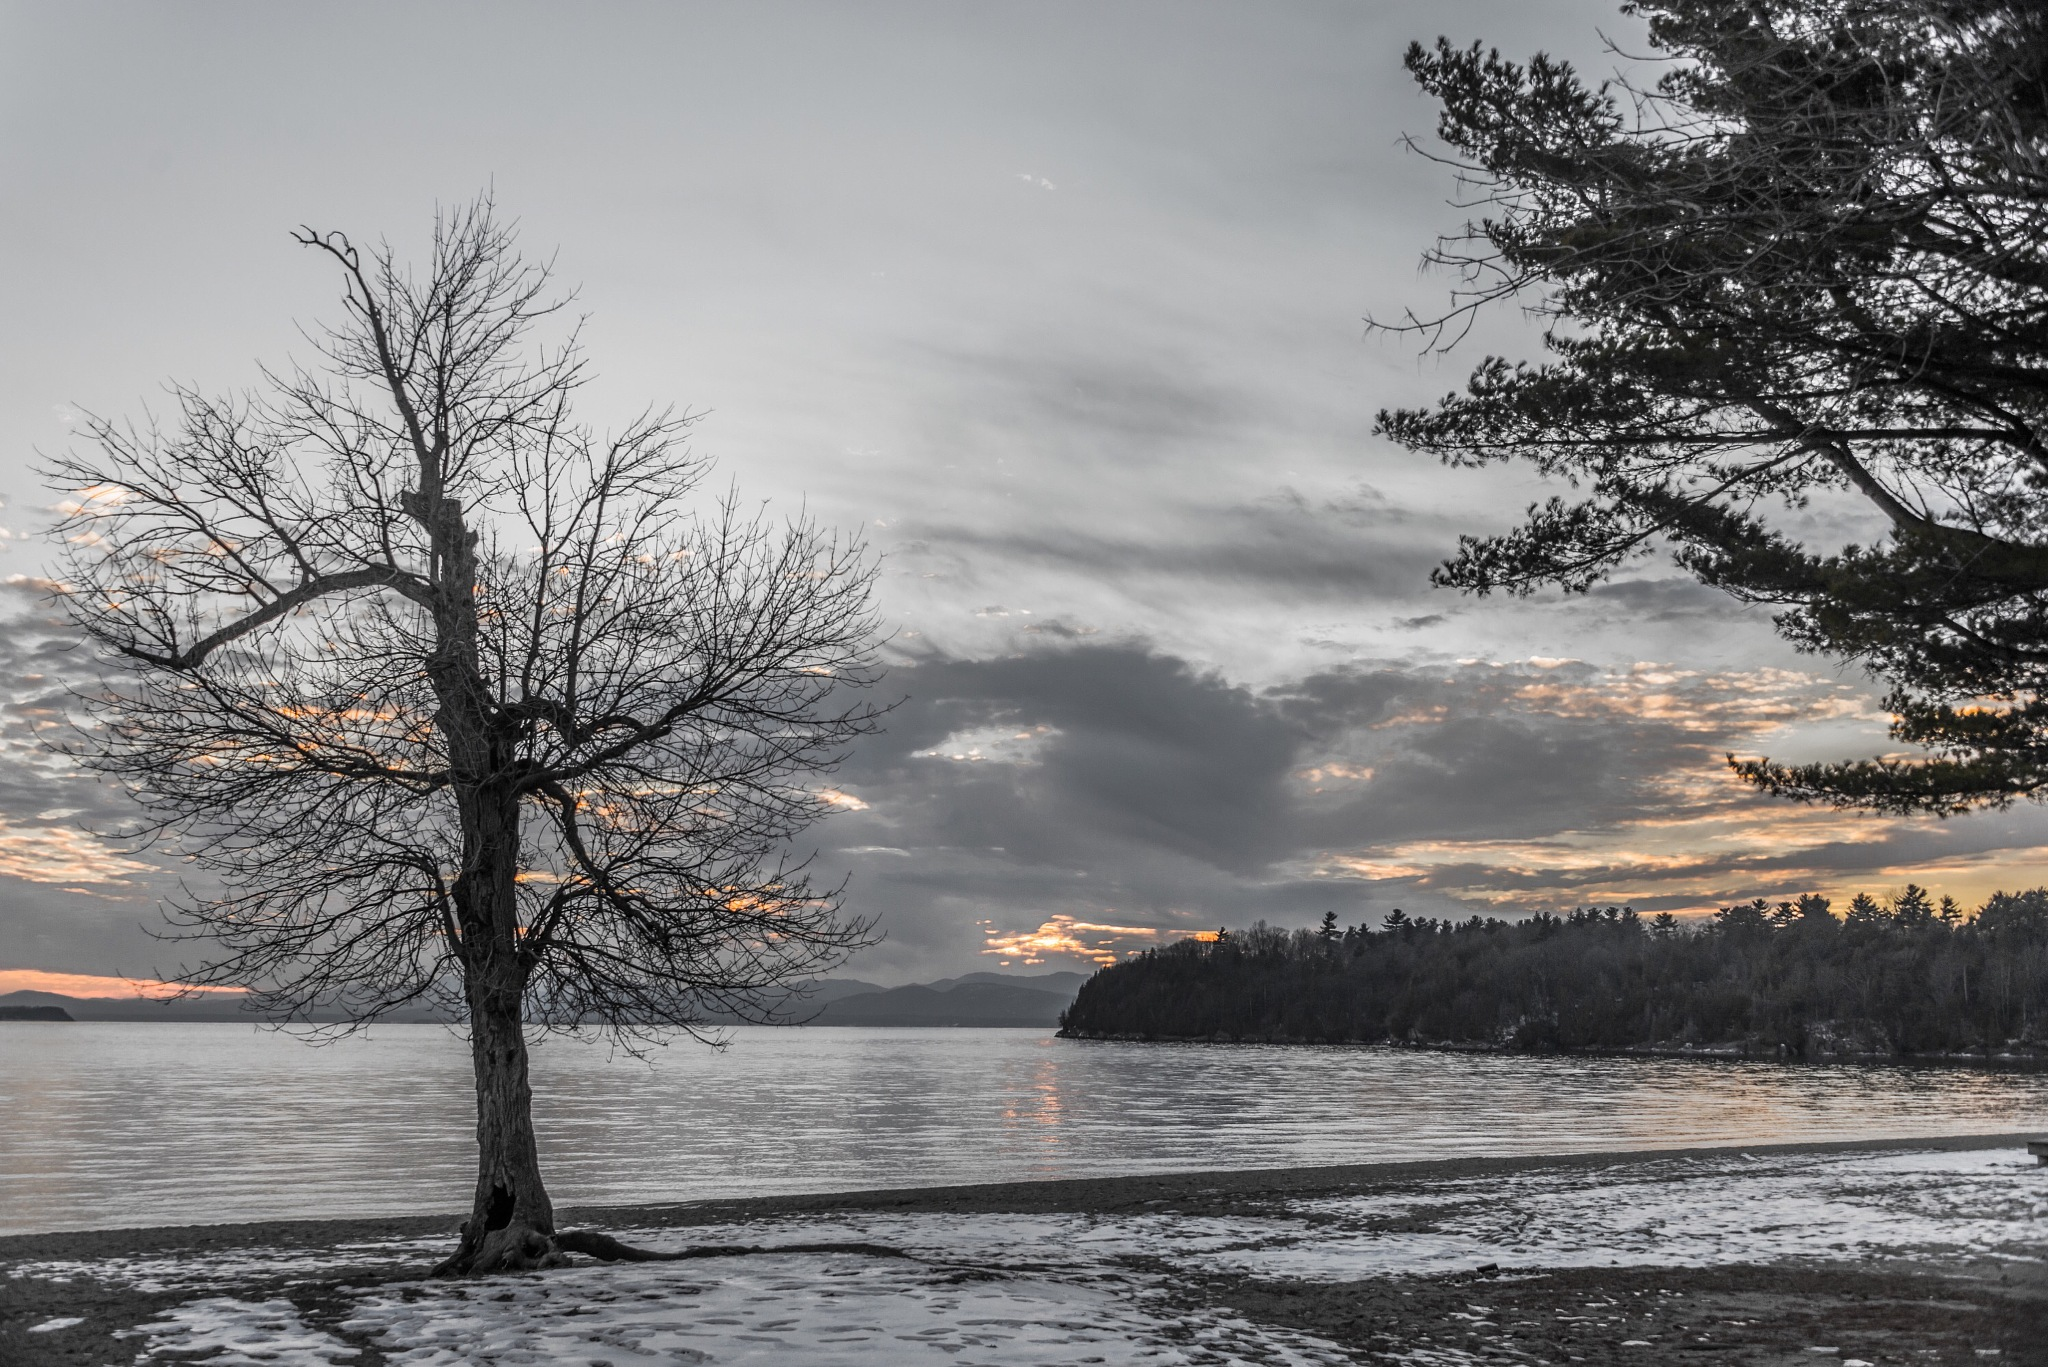 Cold Lake Sunset by Dan Falby